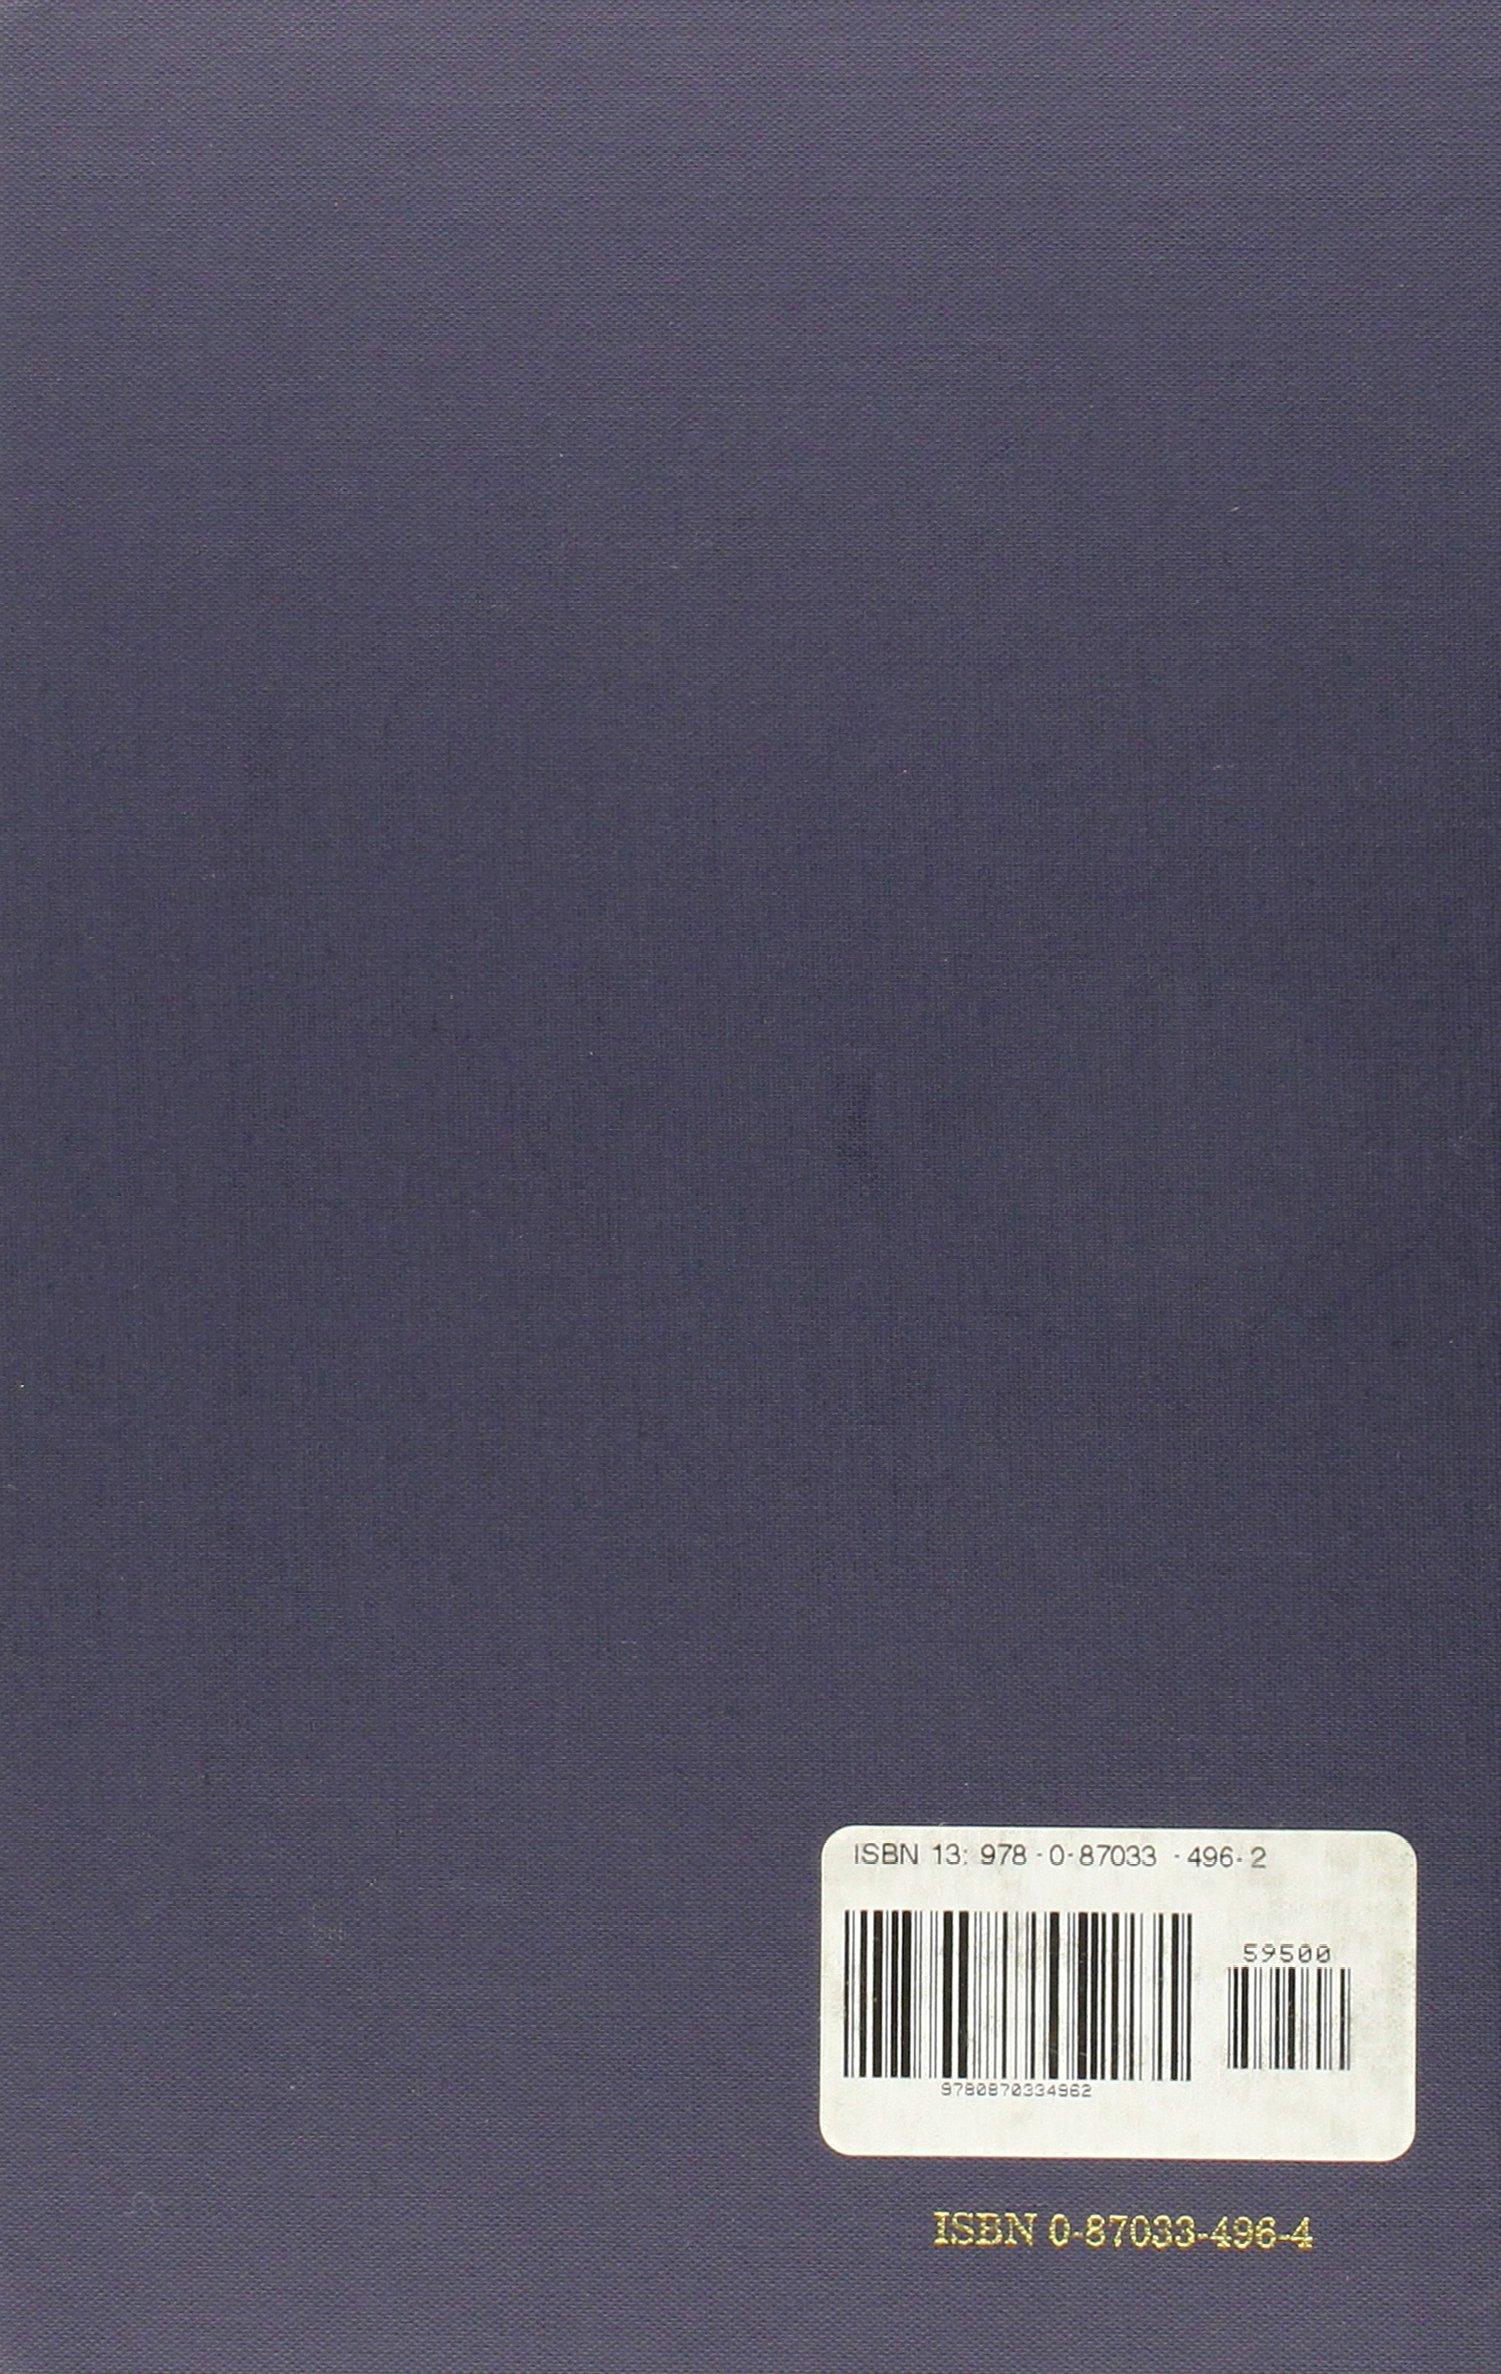 Modern Marine Engineer's Manual, Vol. 1: Everett C. Hunt: 9780870334962:  Amazon.com: Books